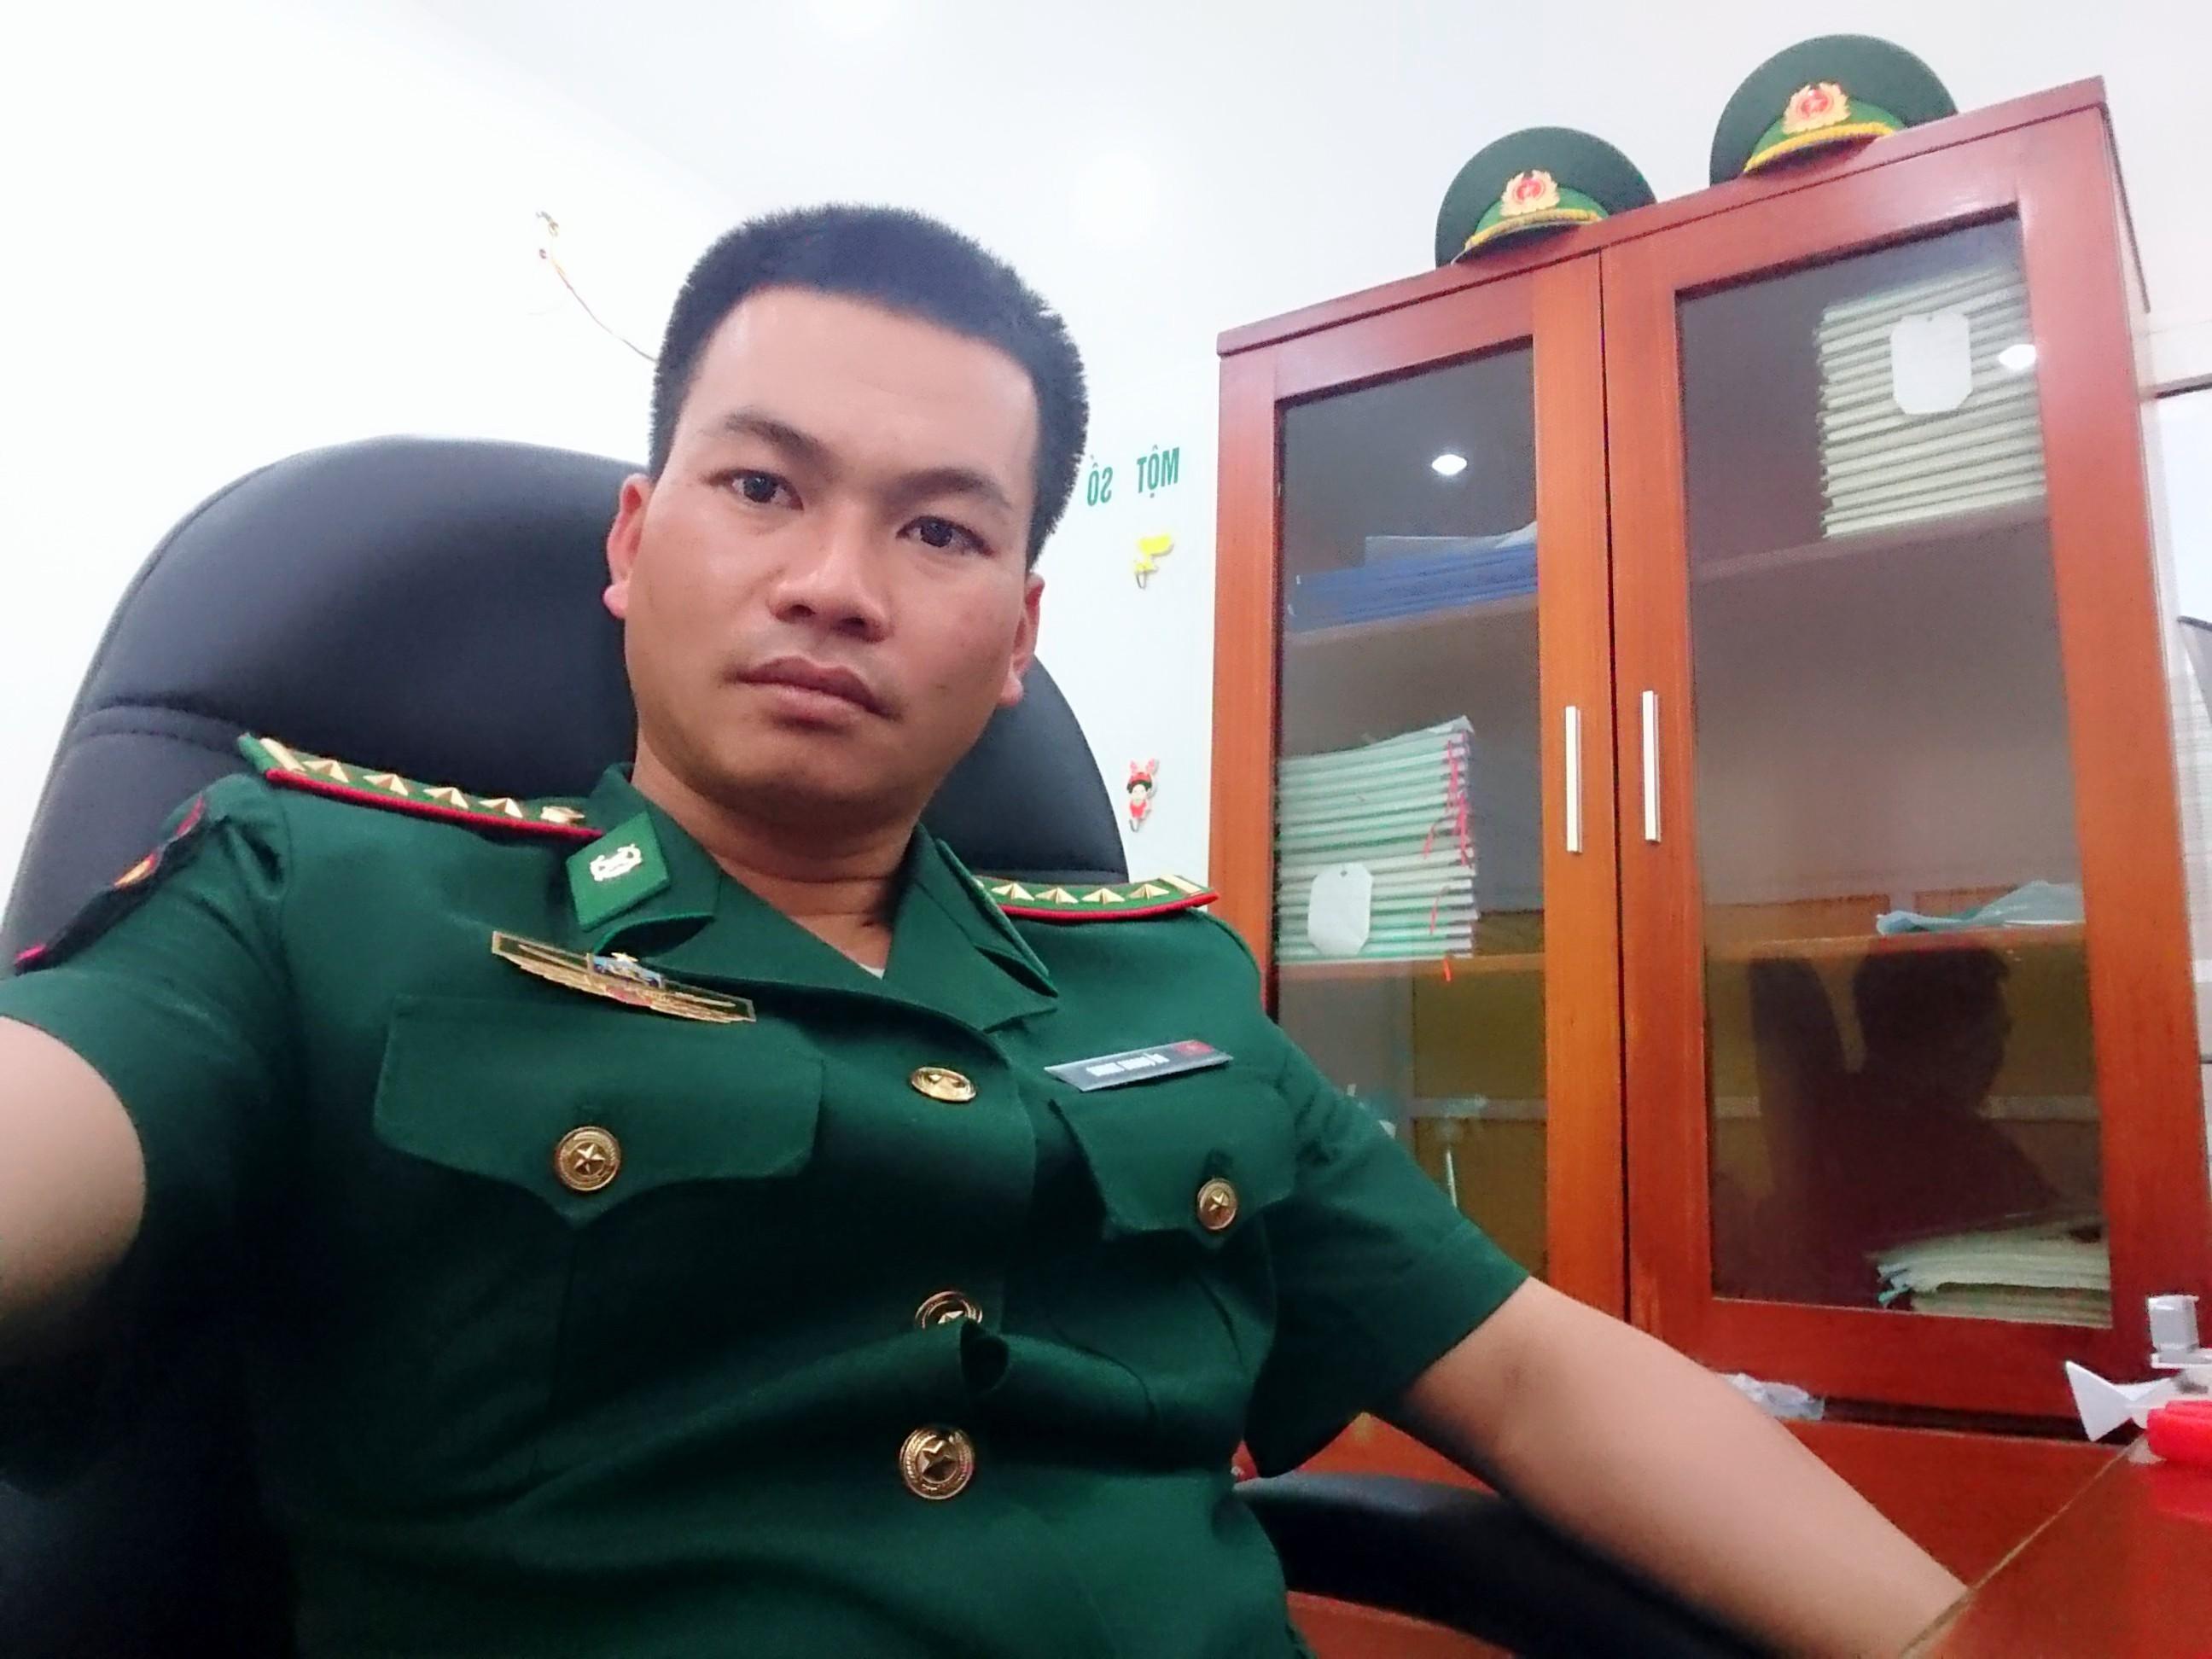 Avatar user Quang Trung